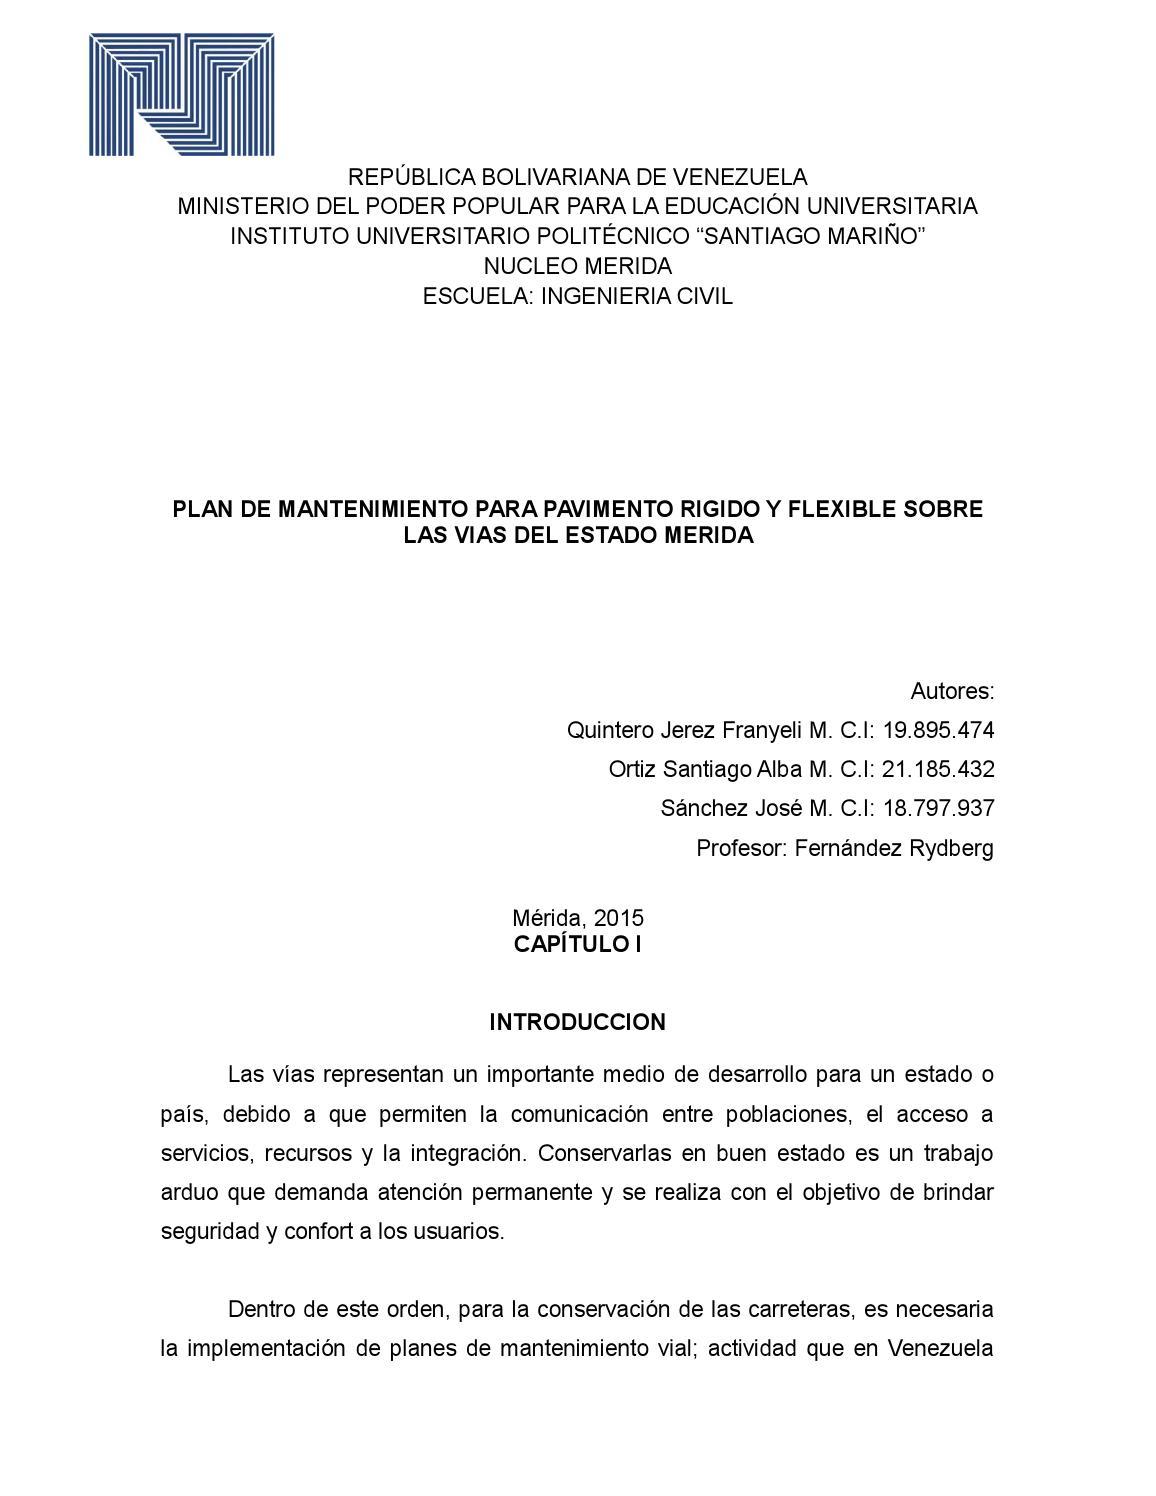 Plan de mantenimiento de Pavimie by Miguel Paredes Montilla - issuu